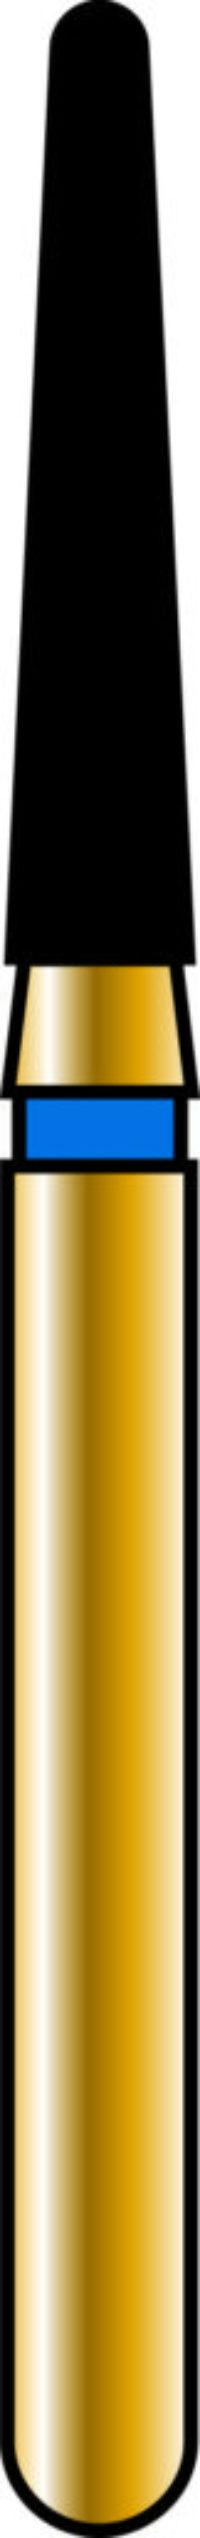 Round End Taper 16-8mm Gold Diamond Bur